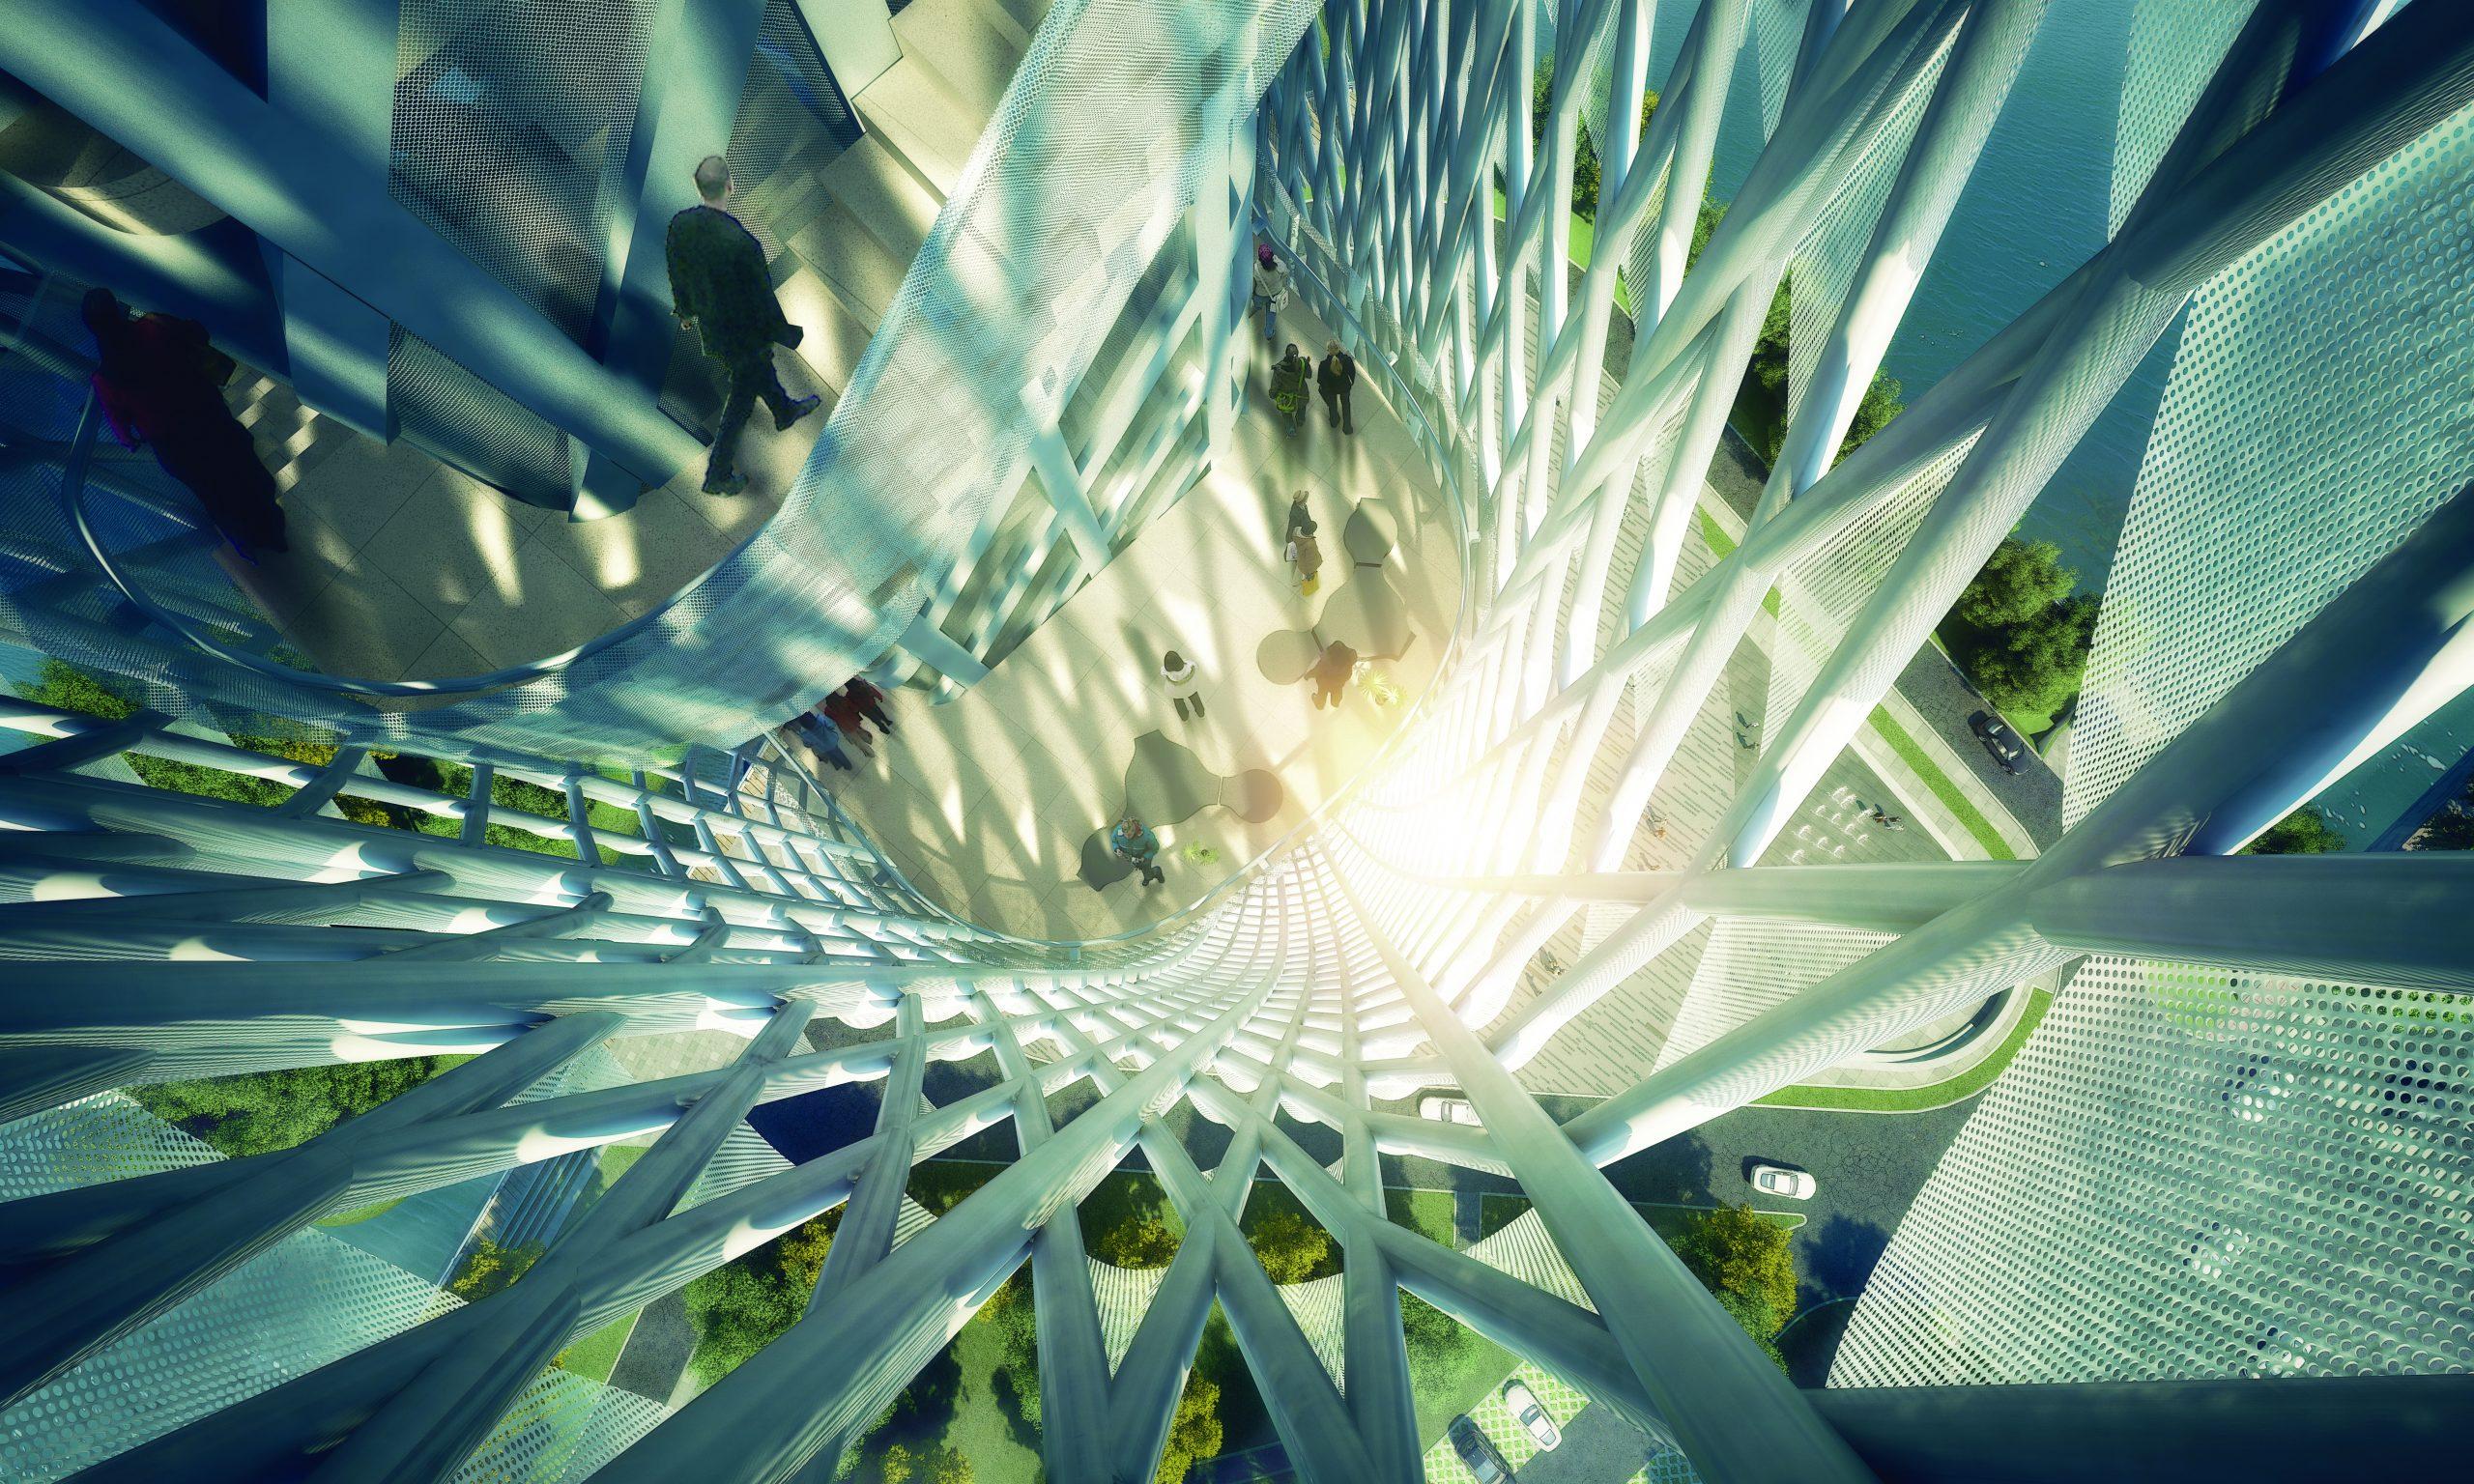 How do Parametric Design and BIM Represent the Ground for Future Automation?